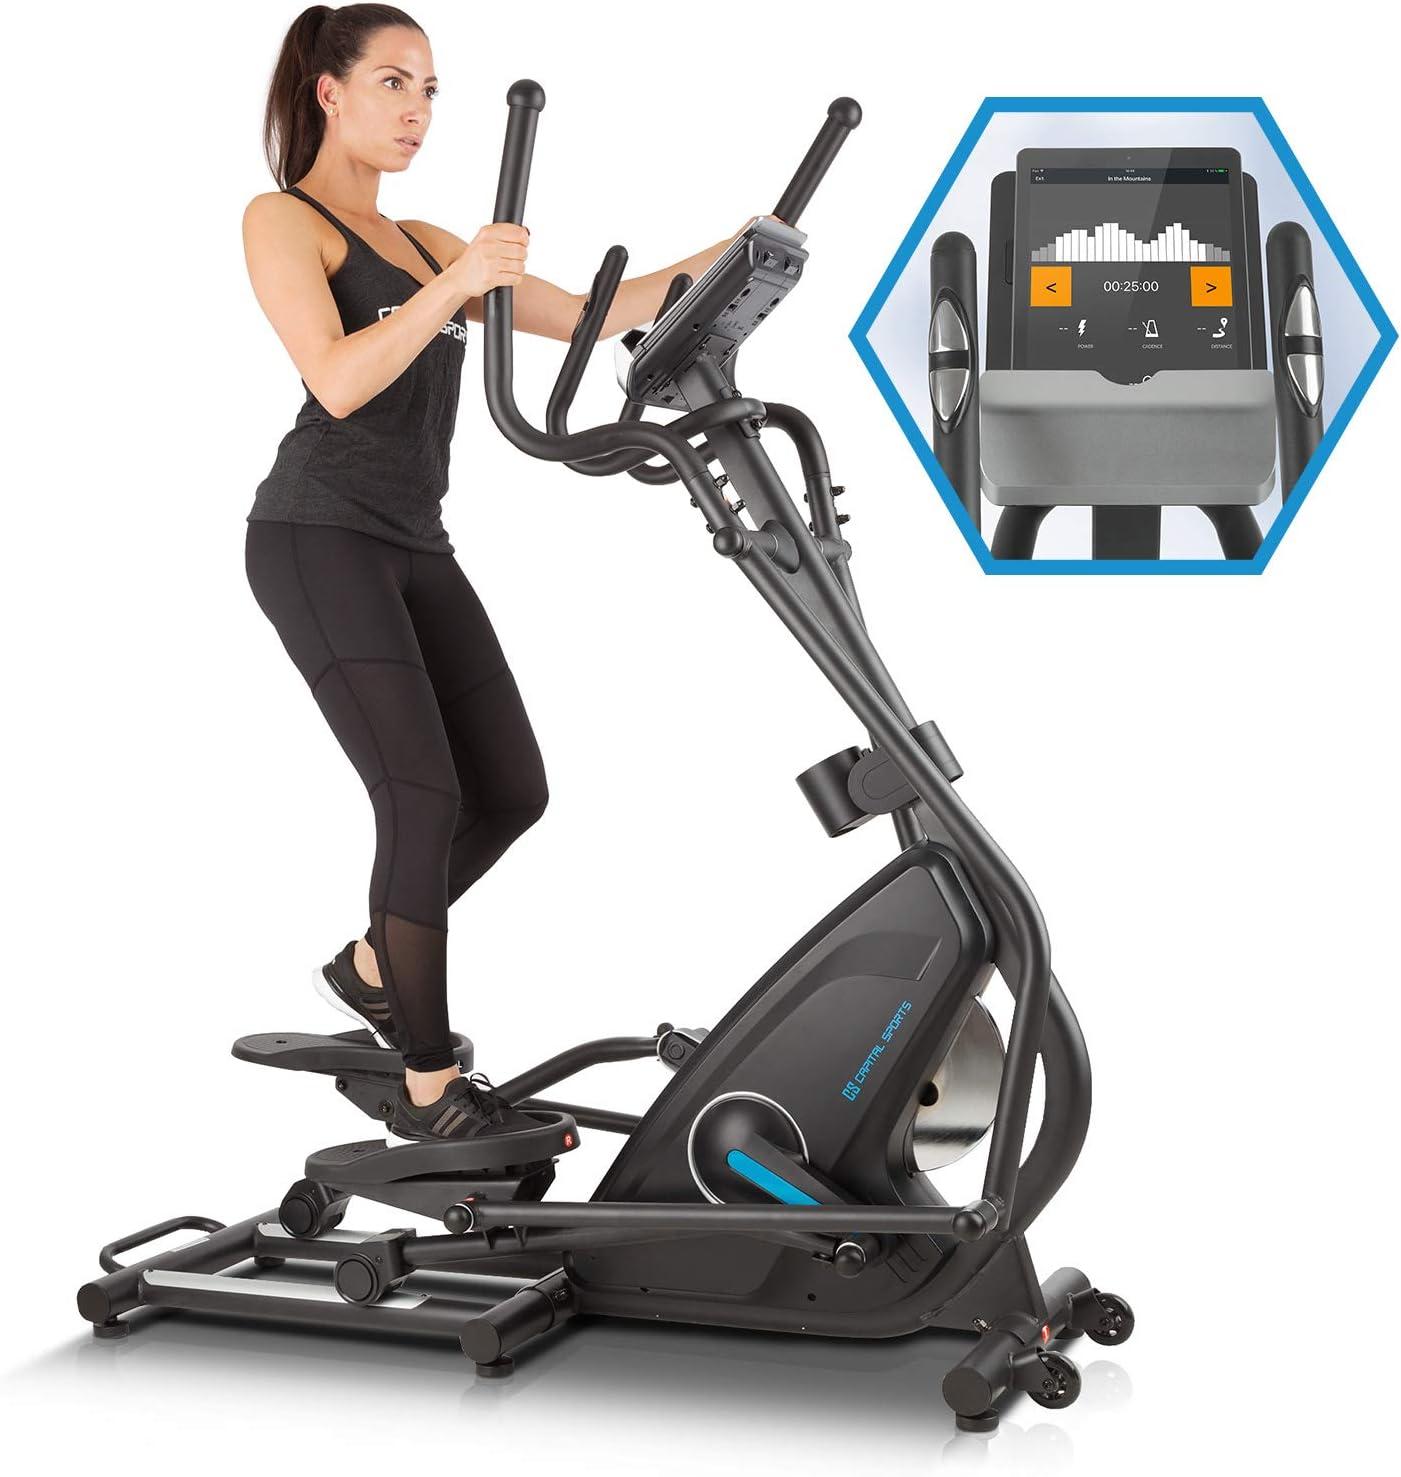 CapitalSports Capital Sports Helix Star DR Bicicleta elíptica obital - Bici elíptica, Compatible con Kinomap, Bluetooth, Volante de inercia de 27 kg, 32 Niveles de Resistencia, Pulsómetro, Ordenador